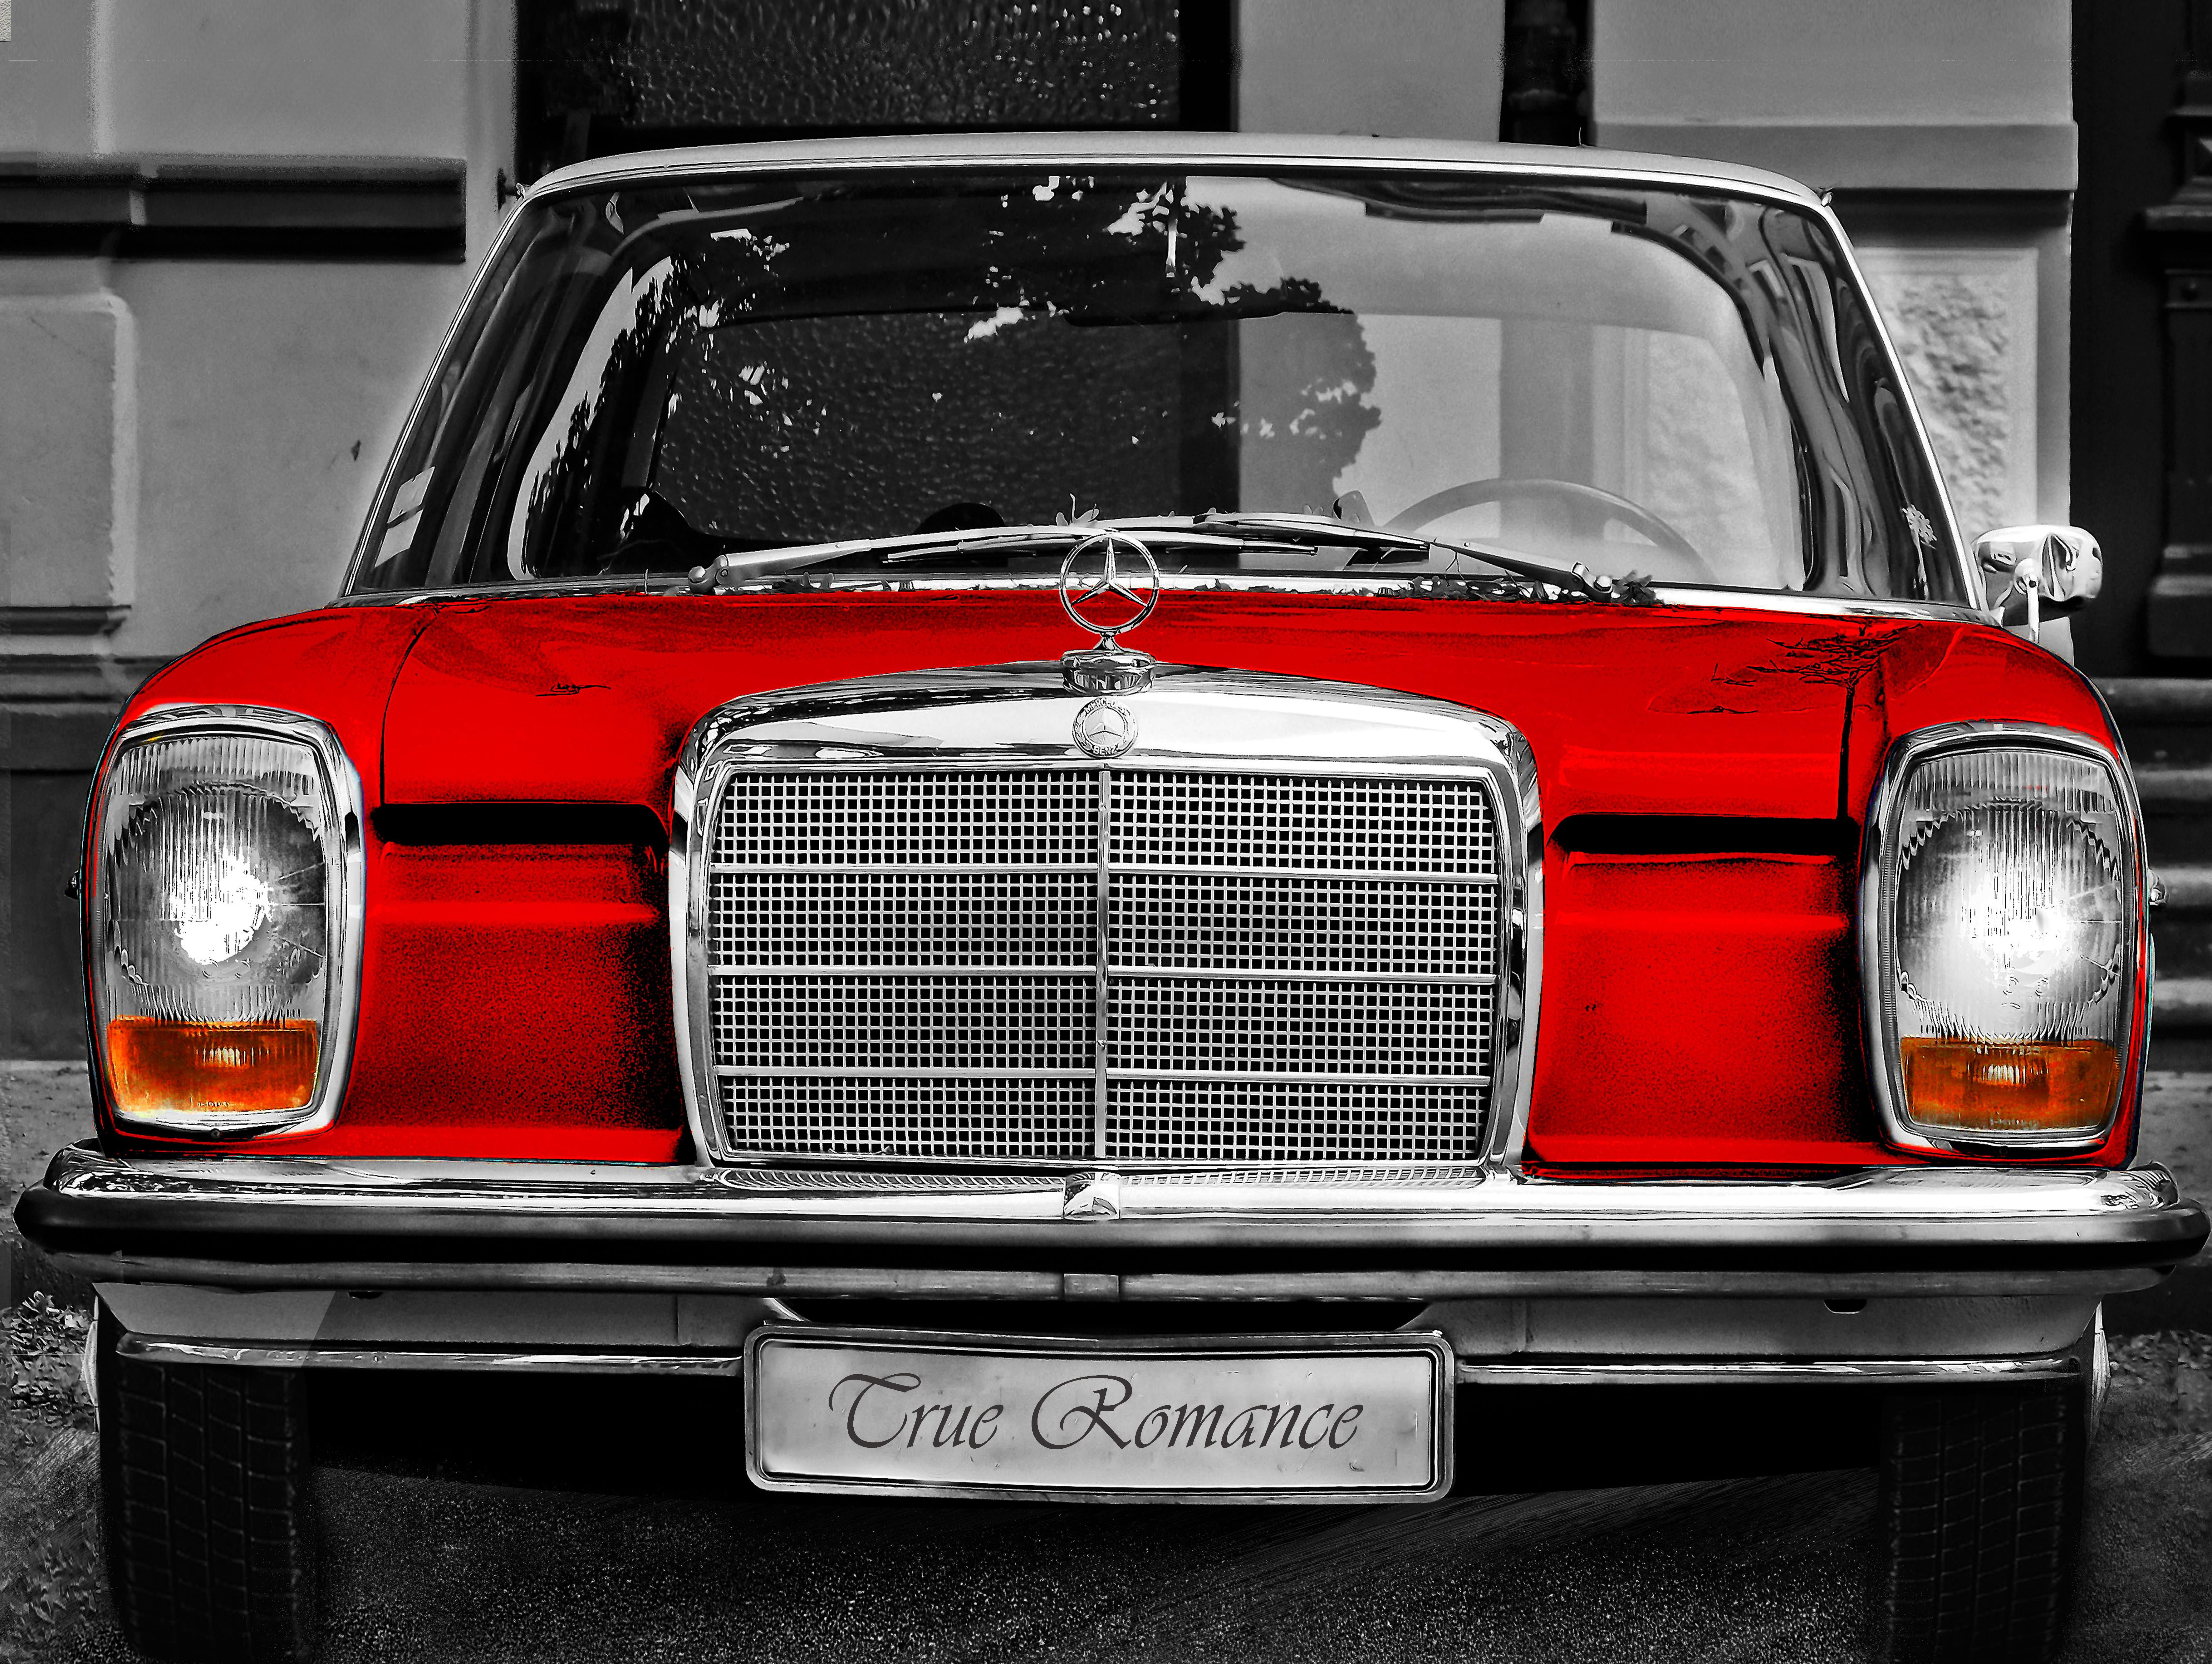 Mercedes W115 Retro Car Mercedes W115 115 Red Old Car Vintage Automobile Vehicle Transportation Road Mercedes W115 Old Classic Cars Buy Classic Cars